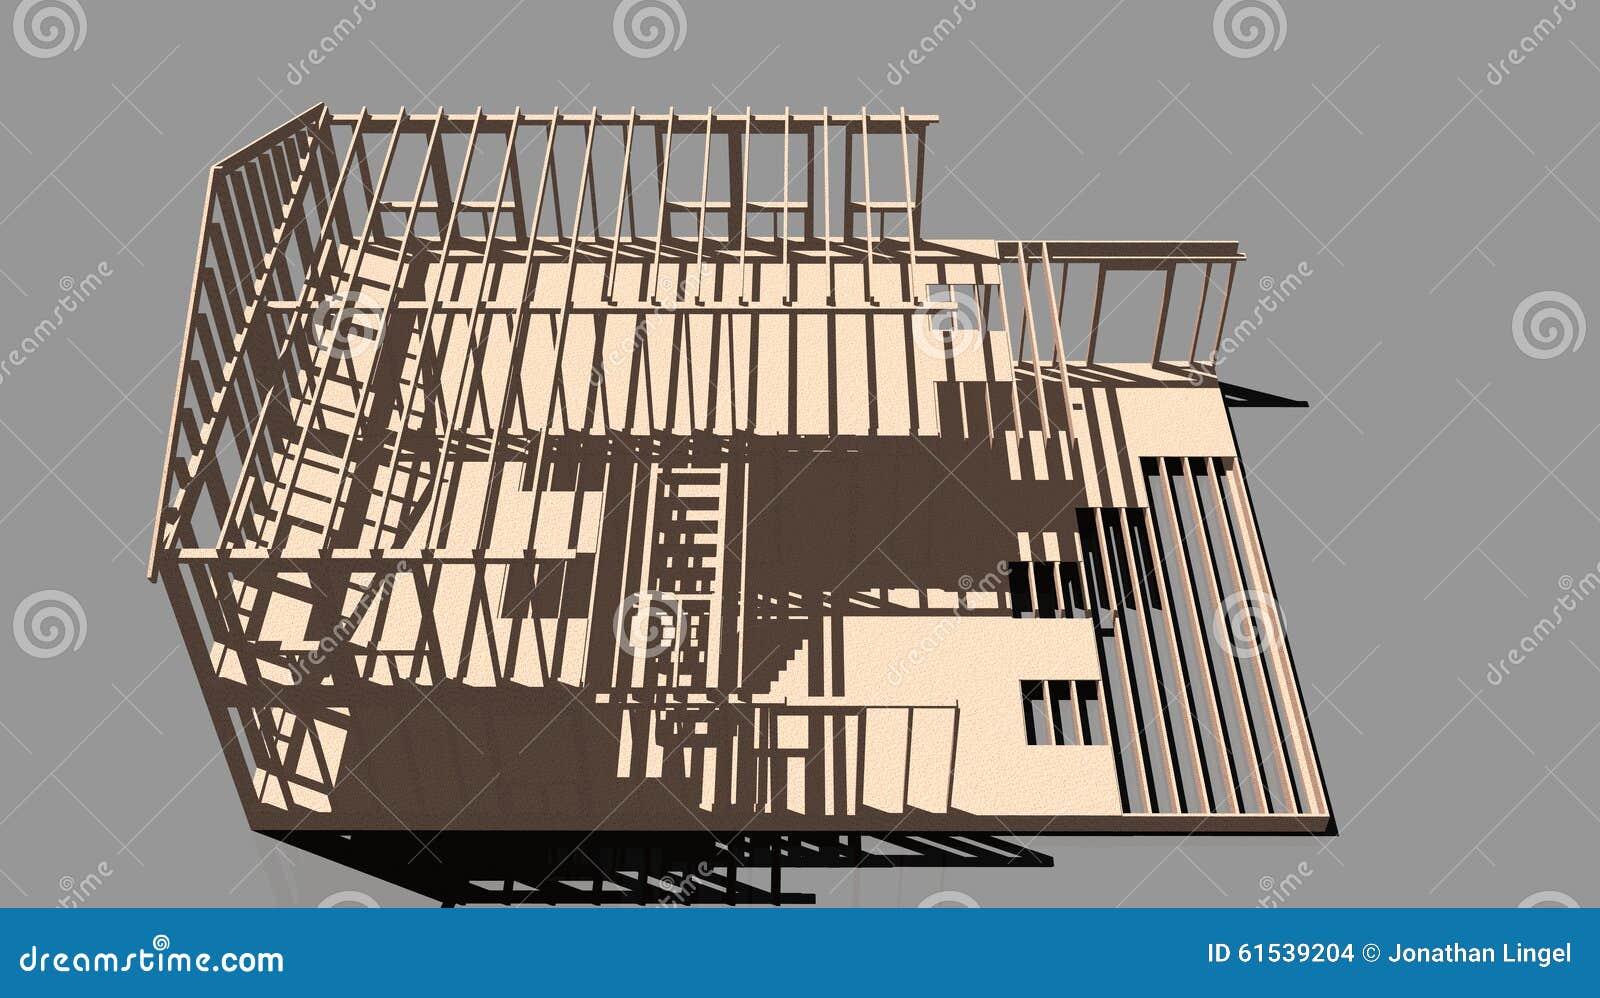 Unfinished House Frame Illustration 61539204 Megapixl. Unfinished House Frame. Wiring. House Frame Diagram Doors At Scoala.co